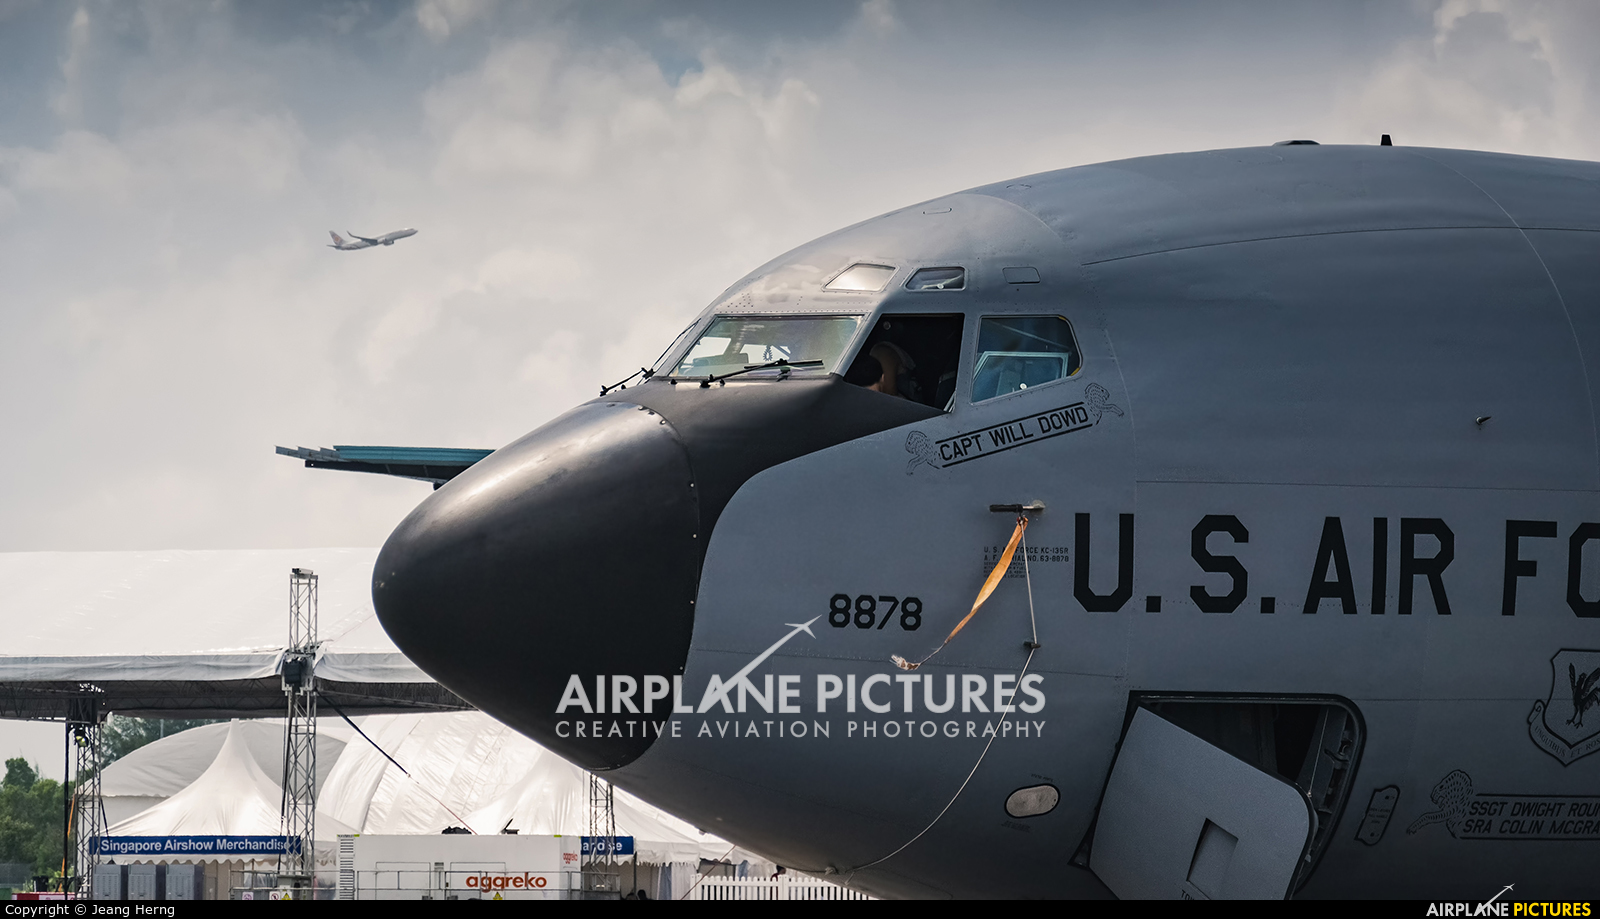 USA - Air Force 63-8878 aircraft at Off Airport - Singapore